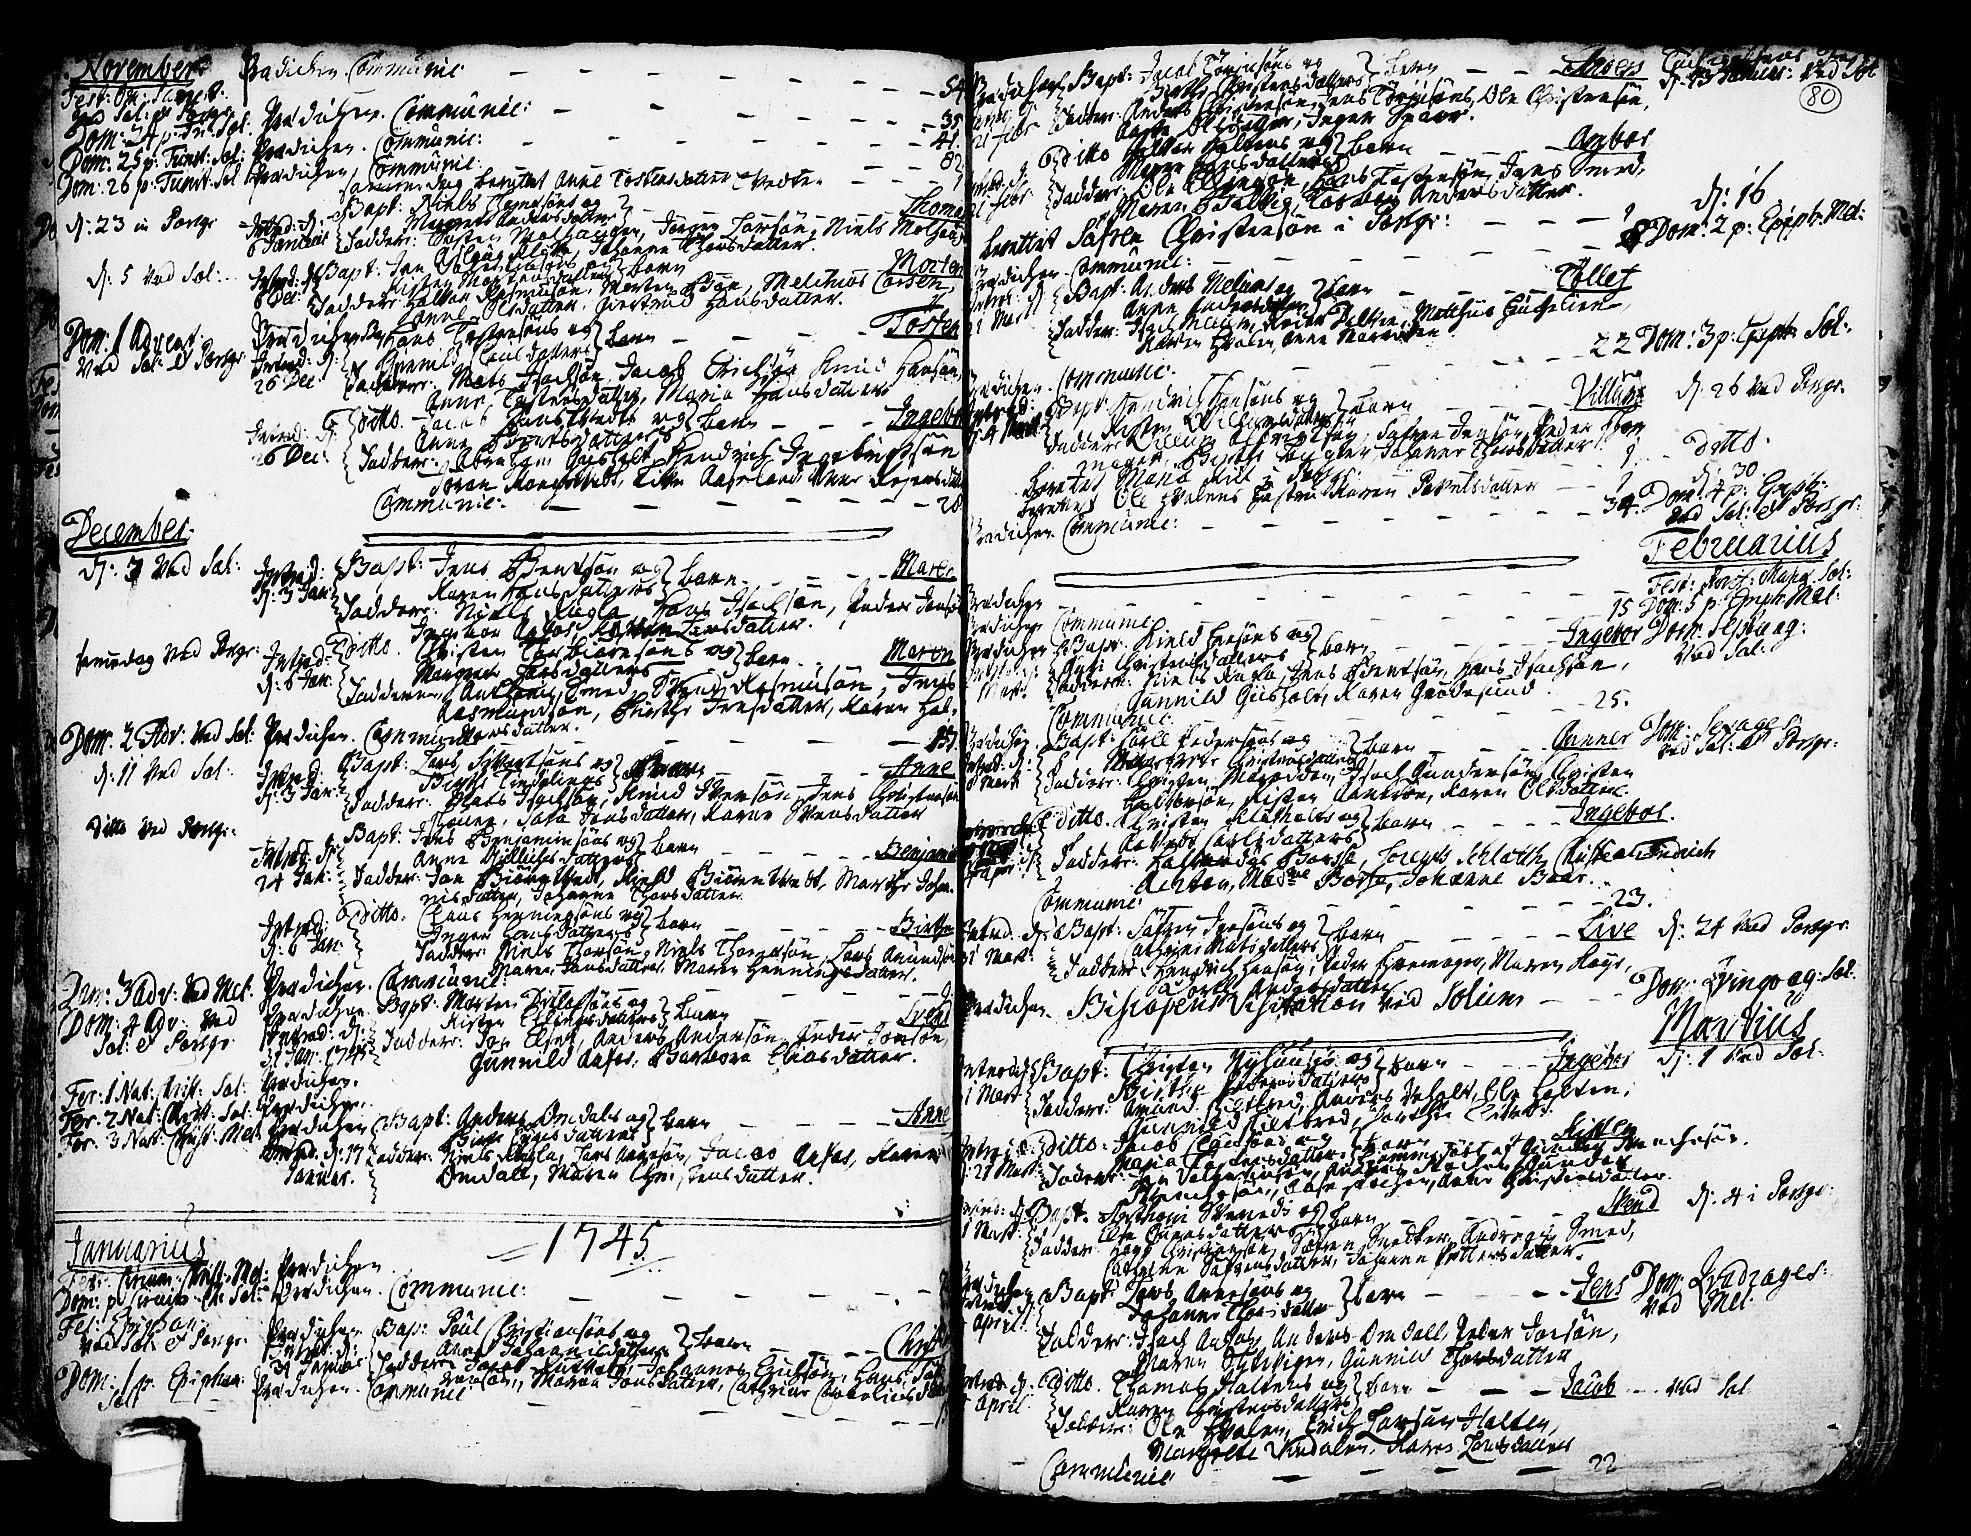 SAKO, Solum kirkebøker, F/Fa/L0002: Ministerialbok nr. I 2, 1713-1761, s. 80